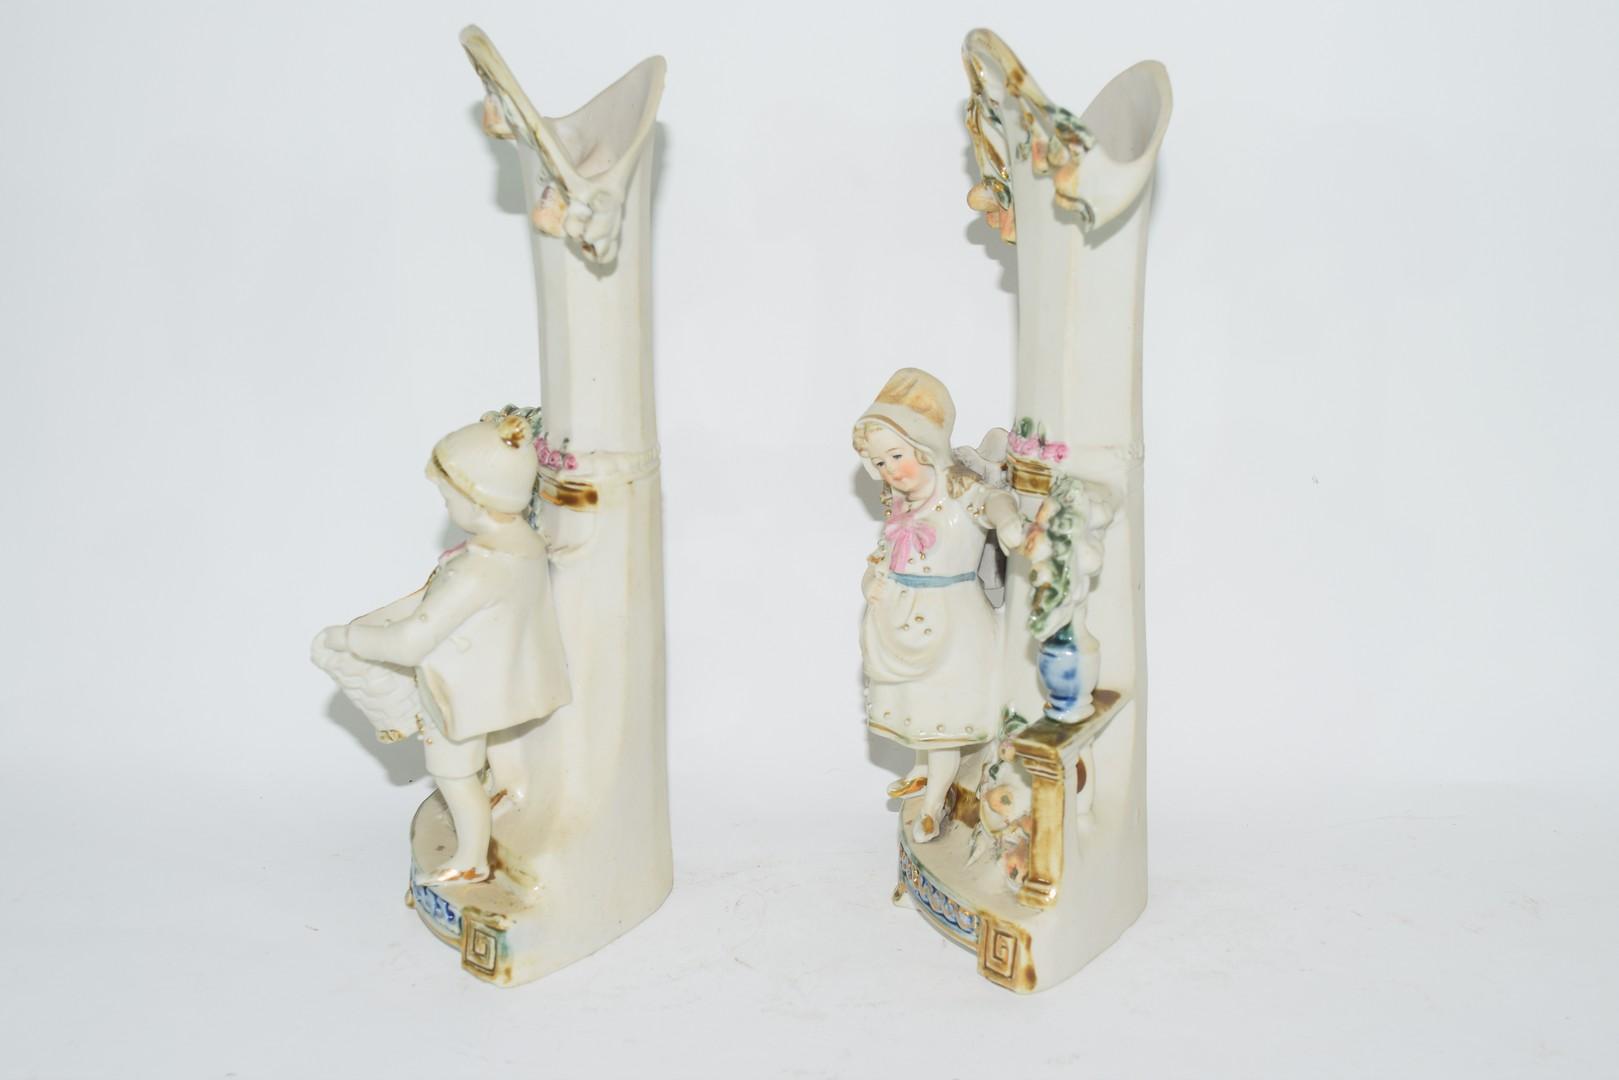 Pair of bisque porcelain spill holder vases - Image 2 of 4